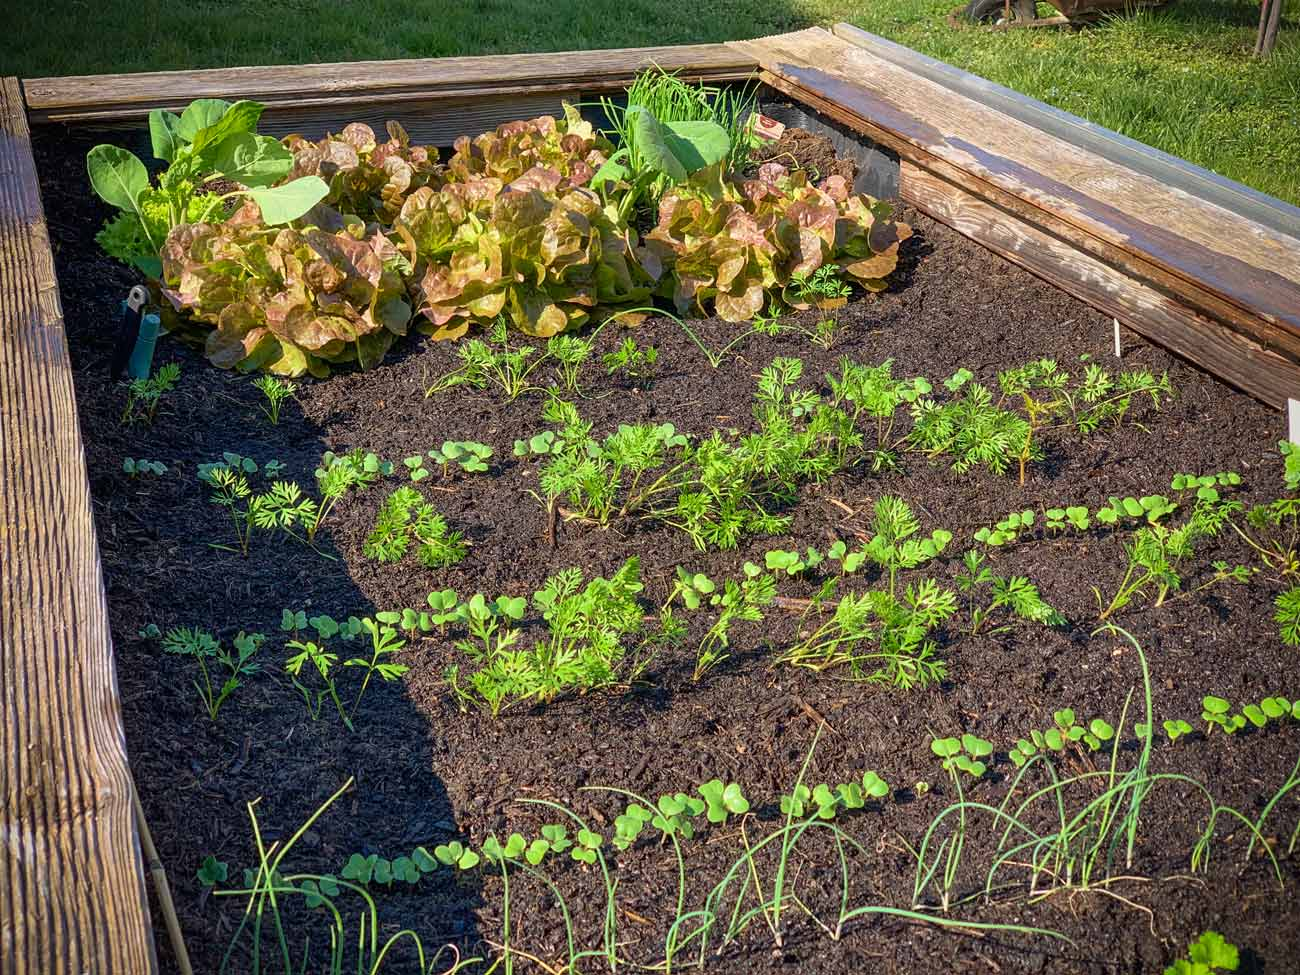 Jungzwiebel-Radieschen-Petersilie-Salat-Hochbeet-April-2020-01